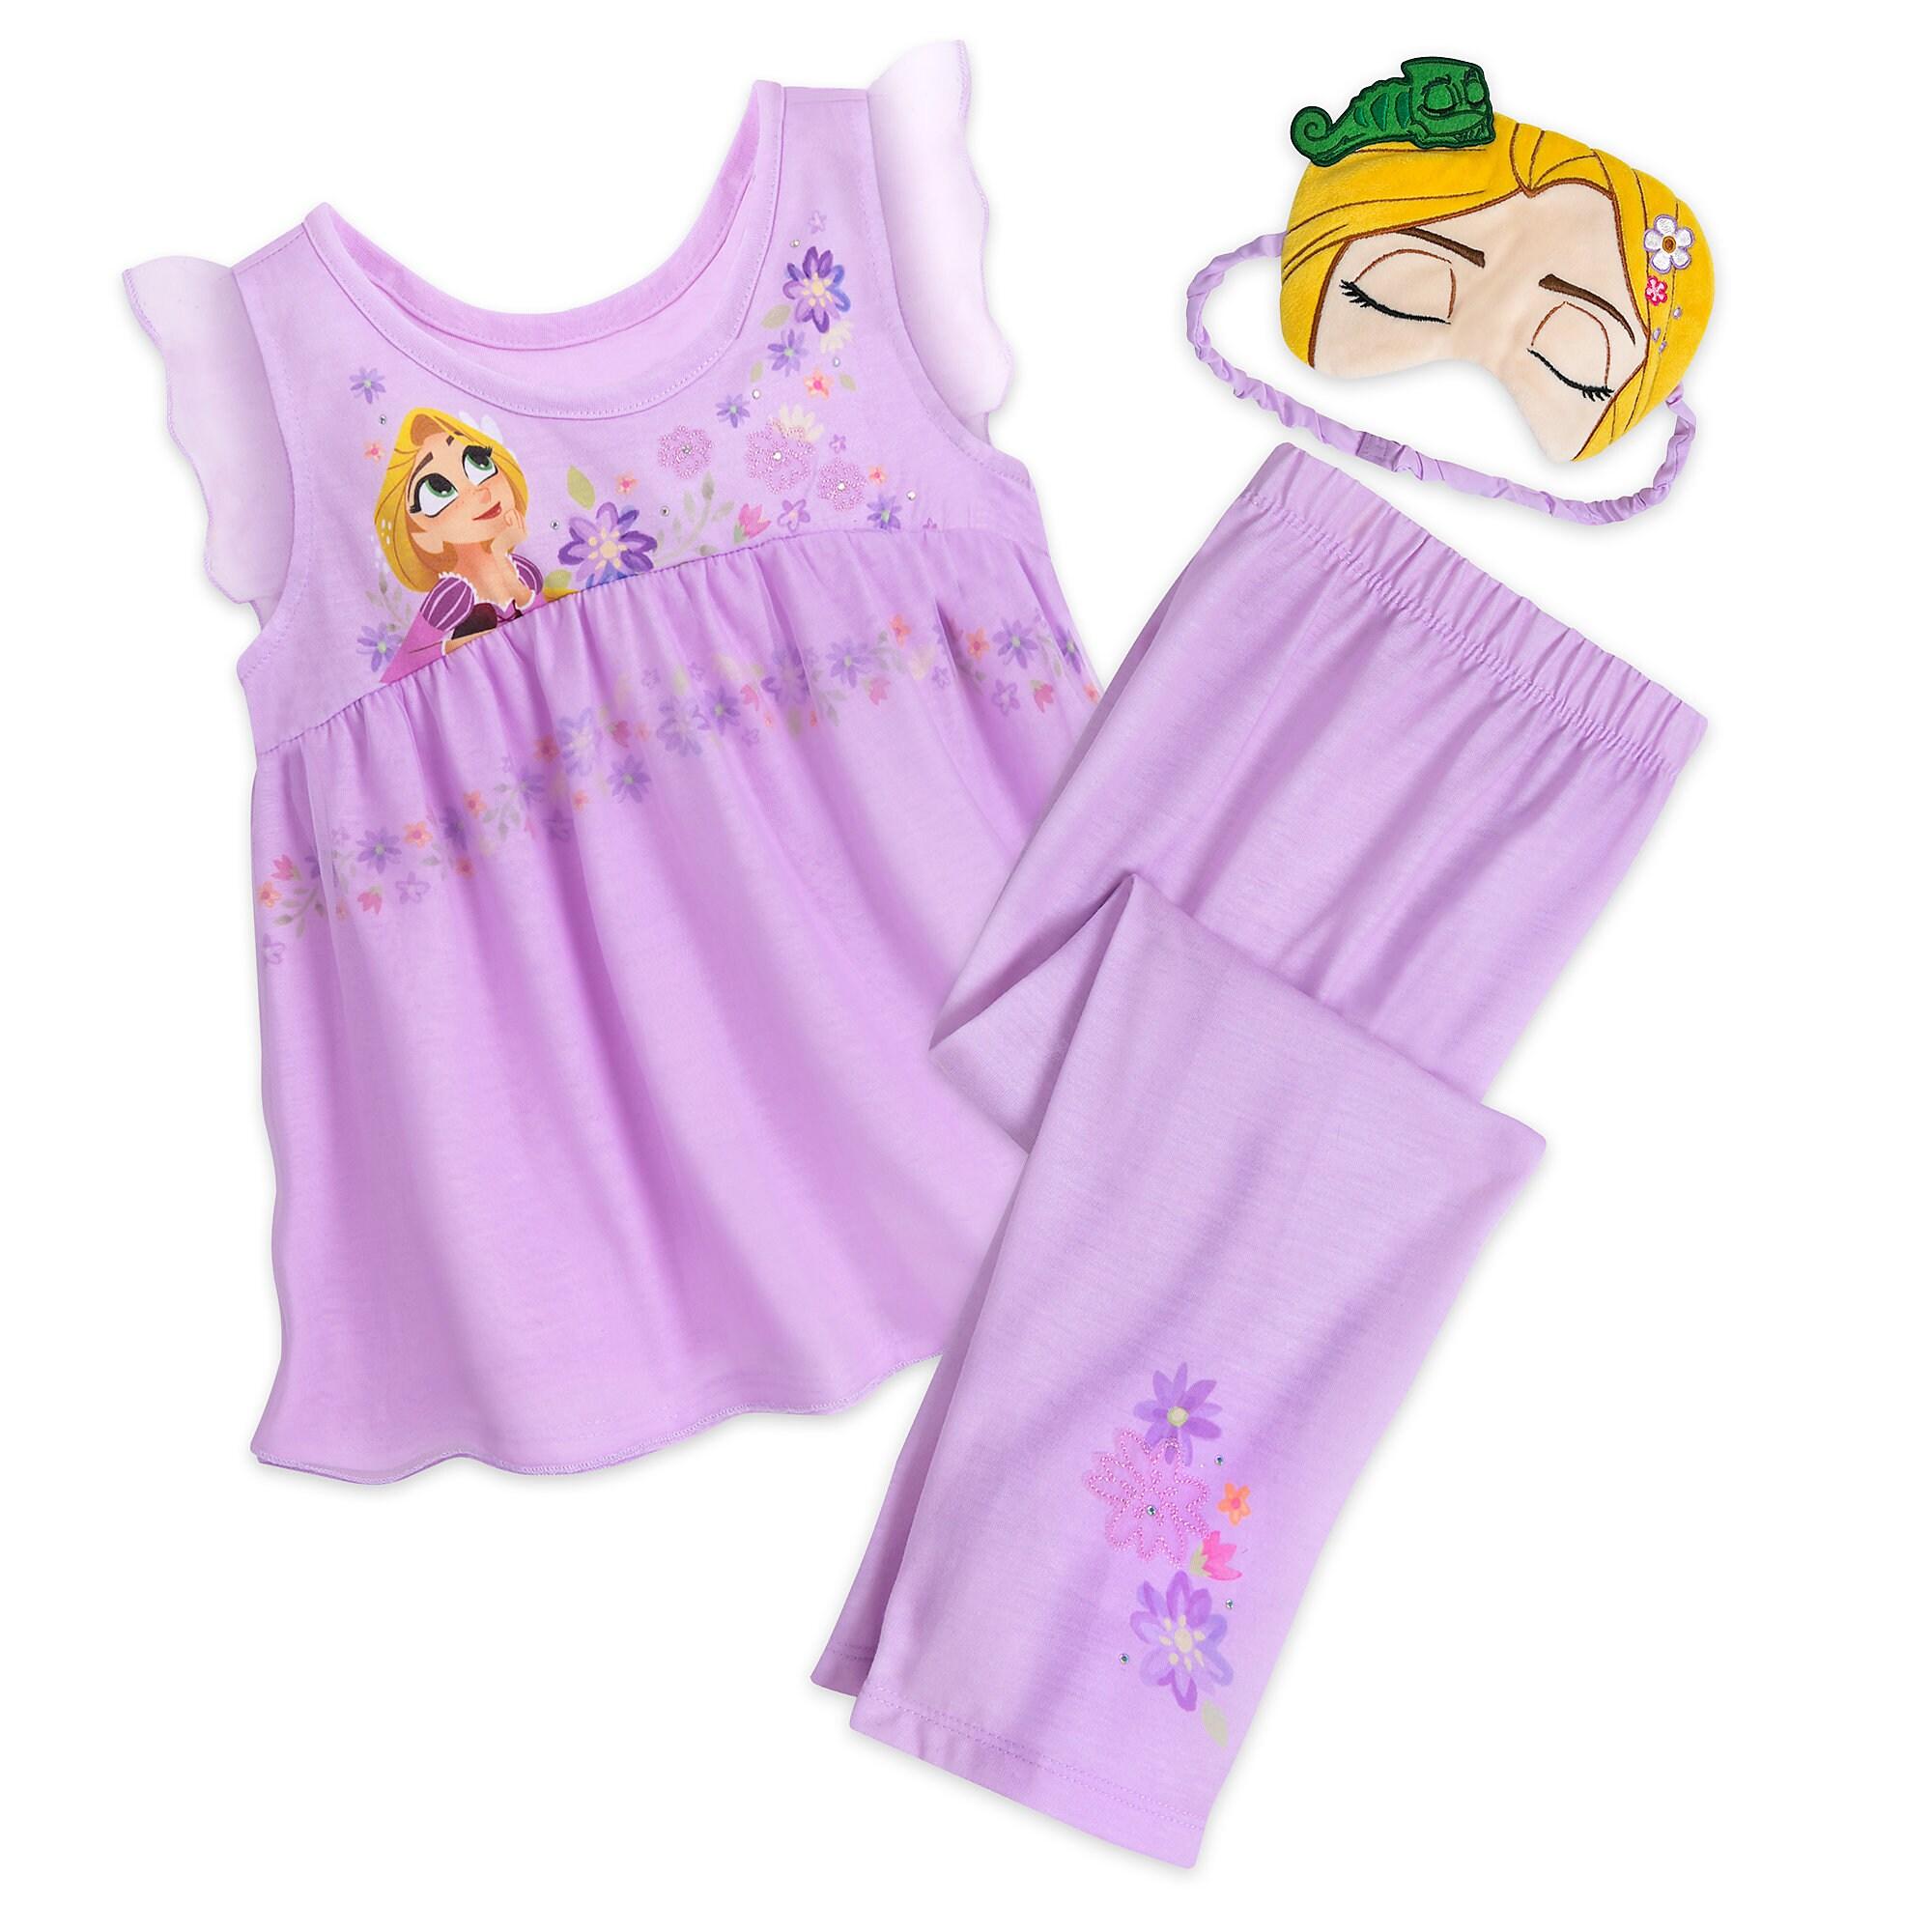 Rapunzel Deluxe Character PJ Set for Kids